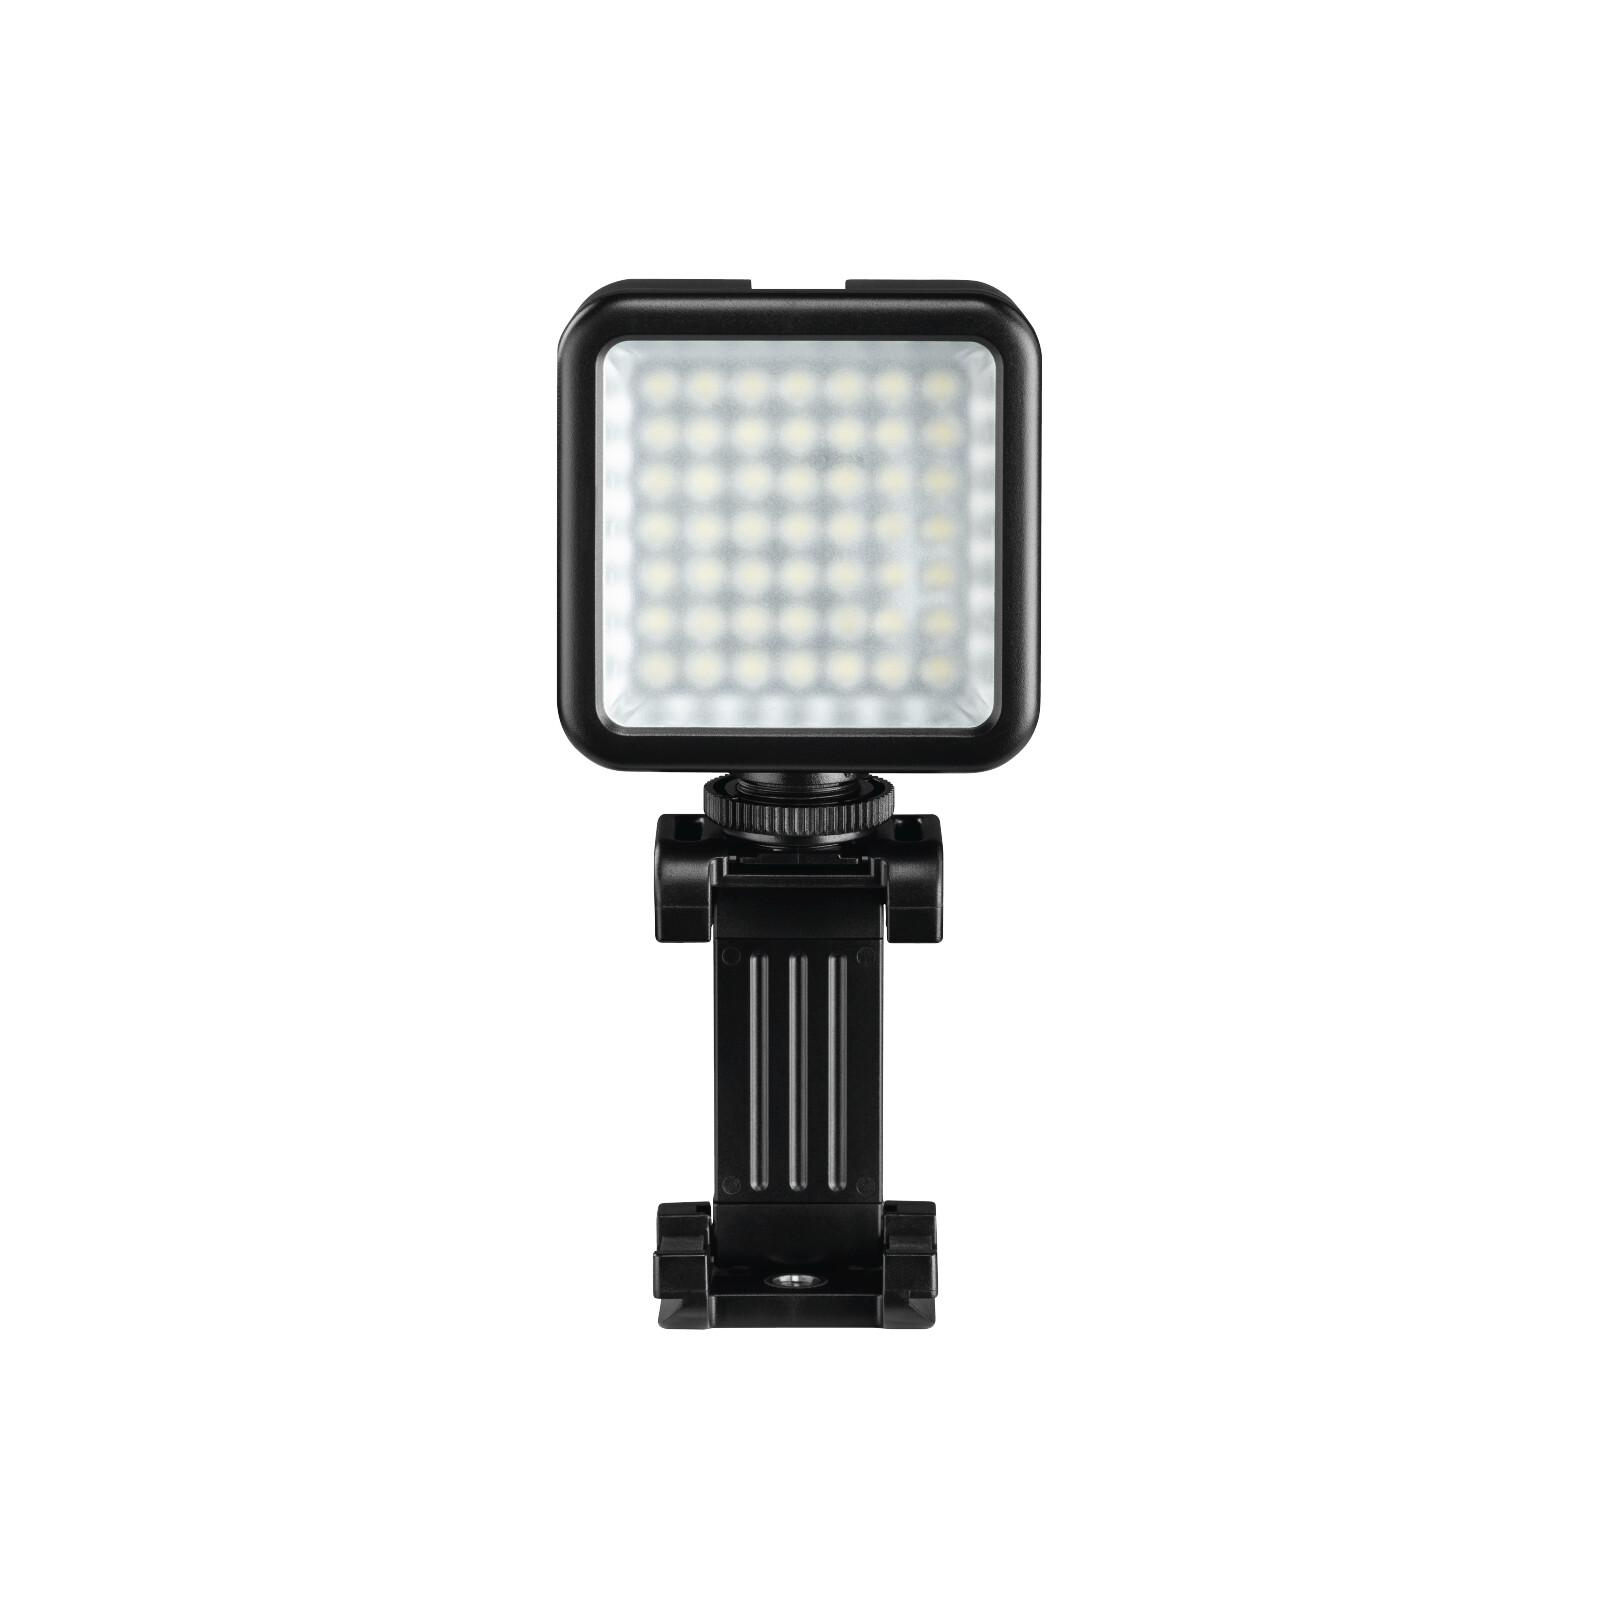 Hama 4641 LED-Leuchte 49BD Smartphones, Fotokamera